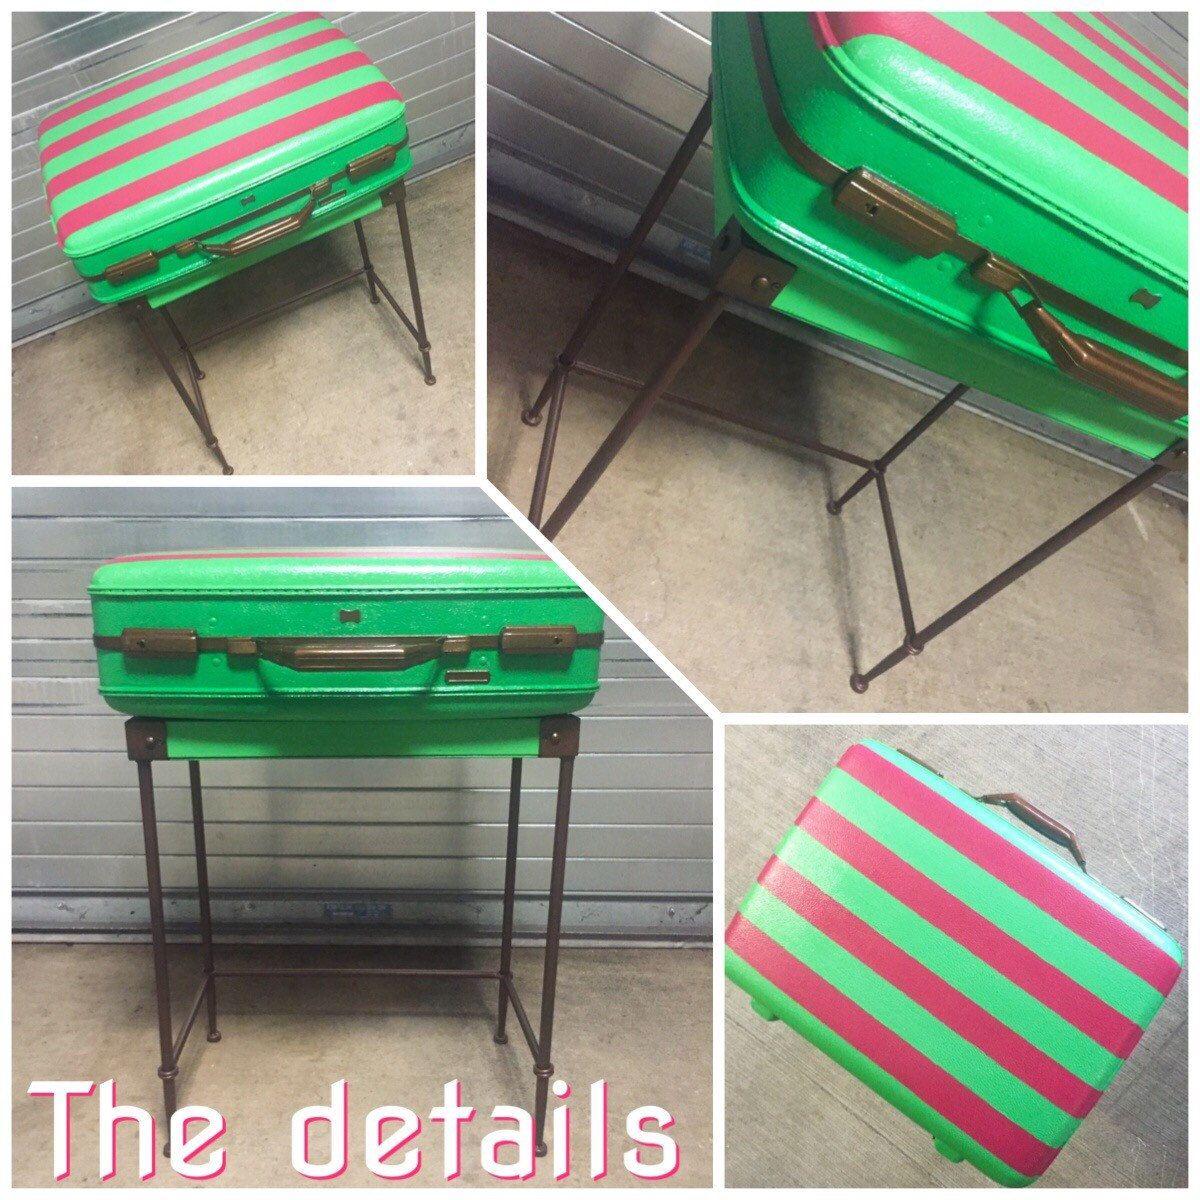 Preppy Suitcase Table #thedetails ETSY.com/shop/TWEAKITSHOP #pinkandgreen #preppydecor #stripes #industrialfurniture #aka #funky #unique #storage #upcycle #retro #vintage